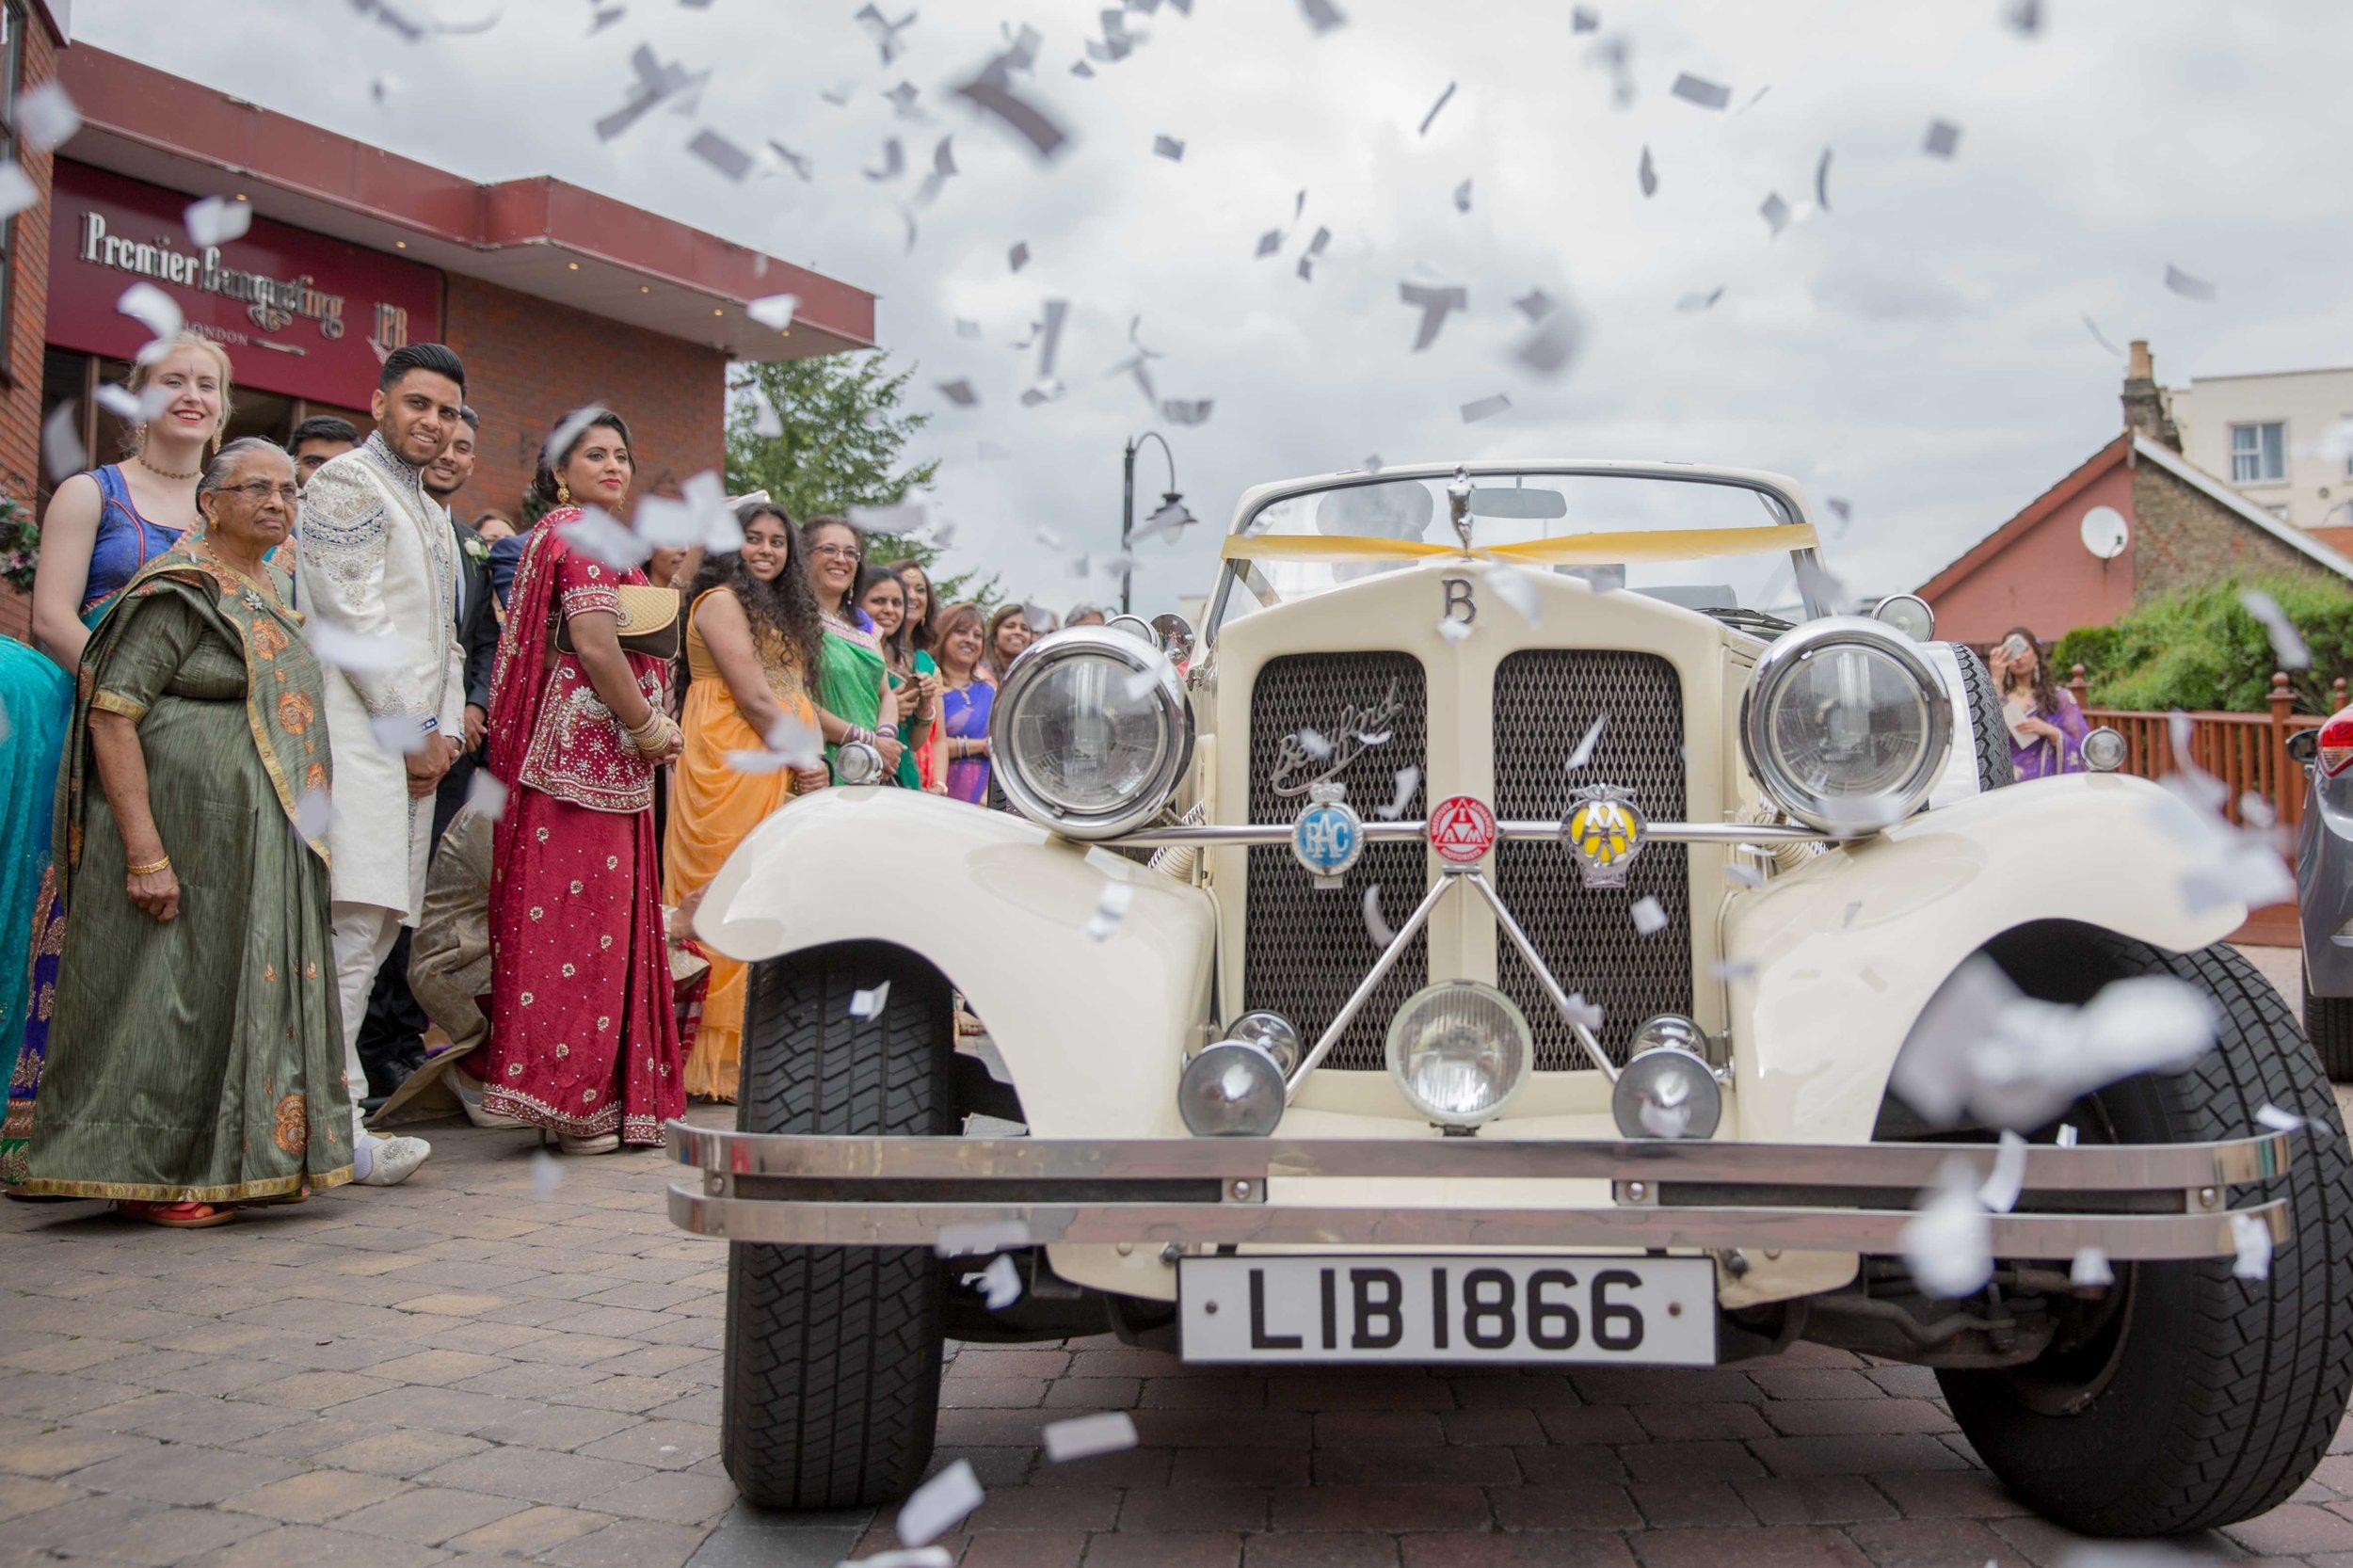 premier-banquetting-london-Hindu-asian-wedding-photographer-natalia-smith-photography-51.jpg